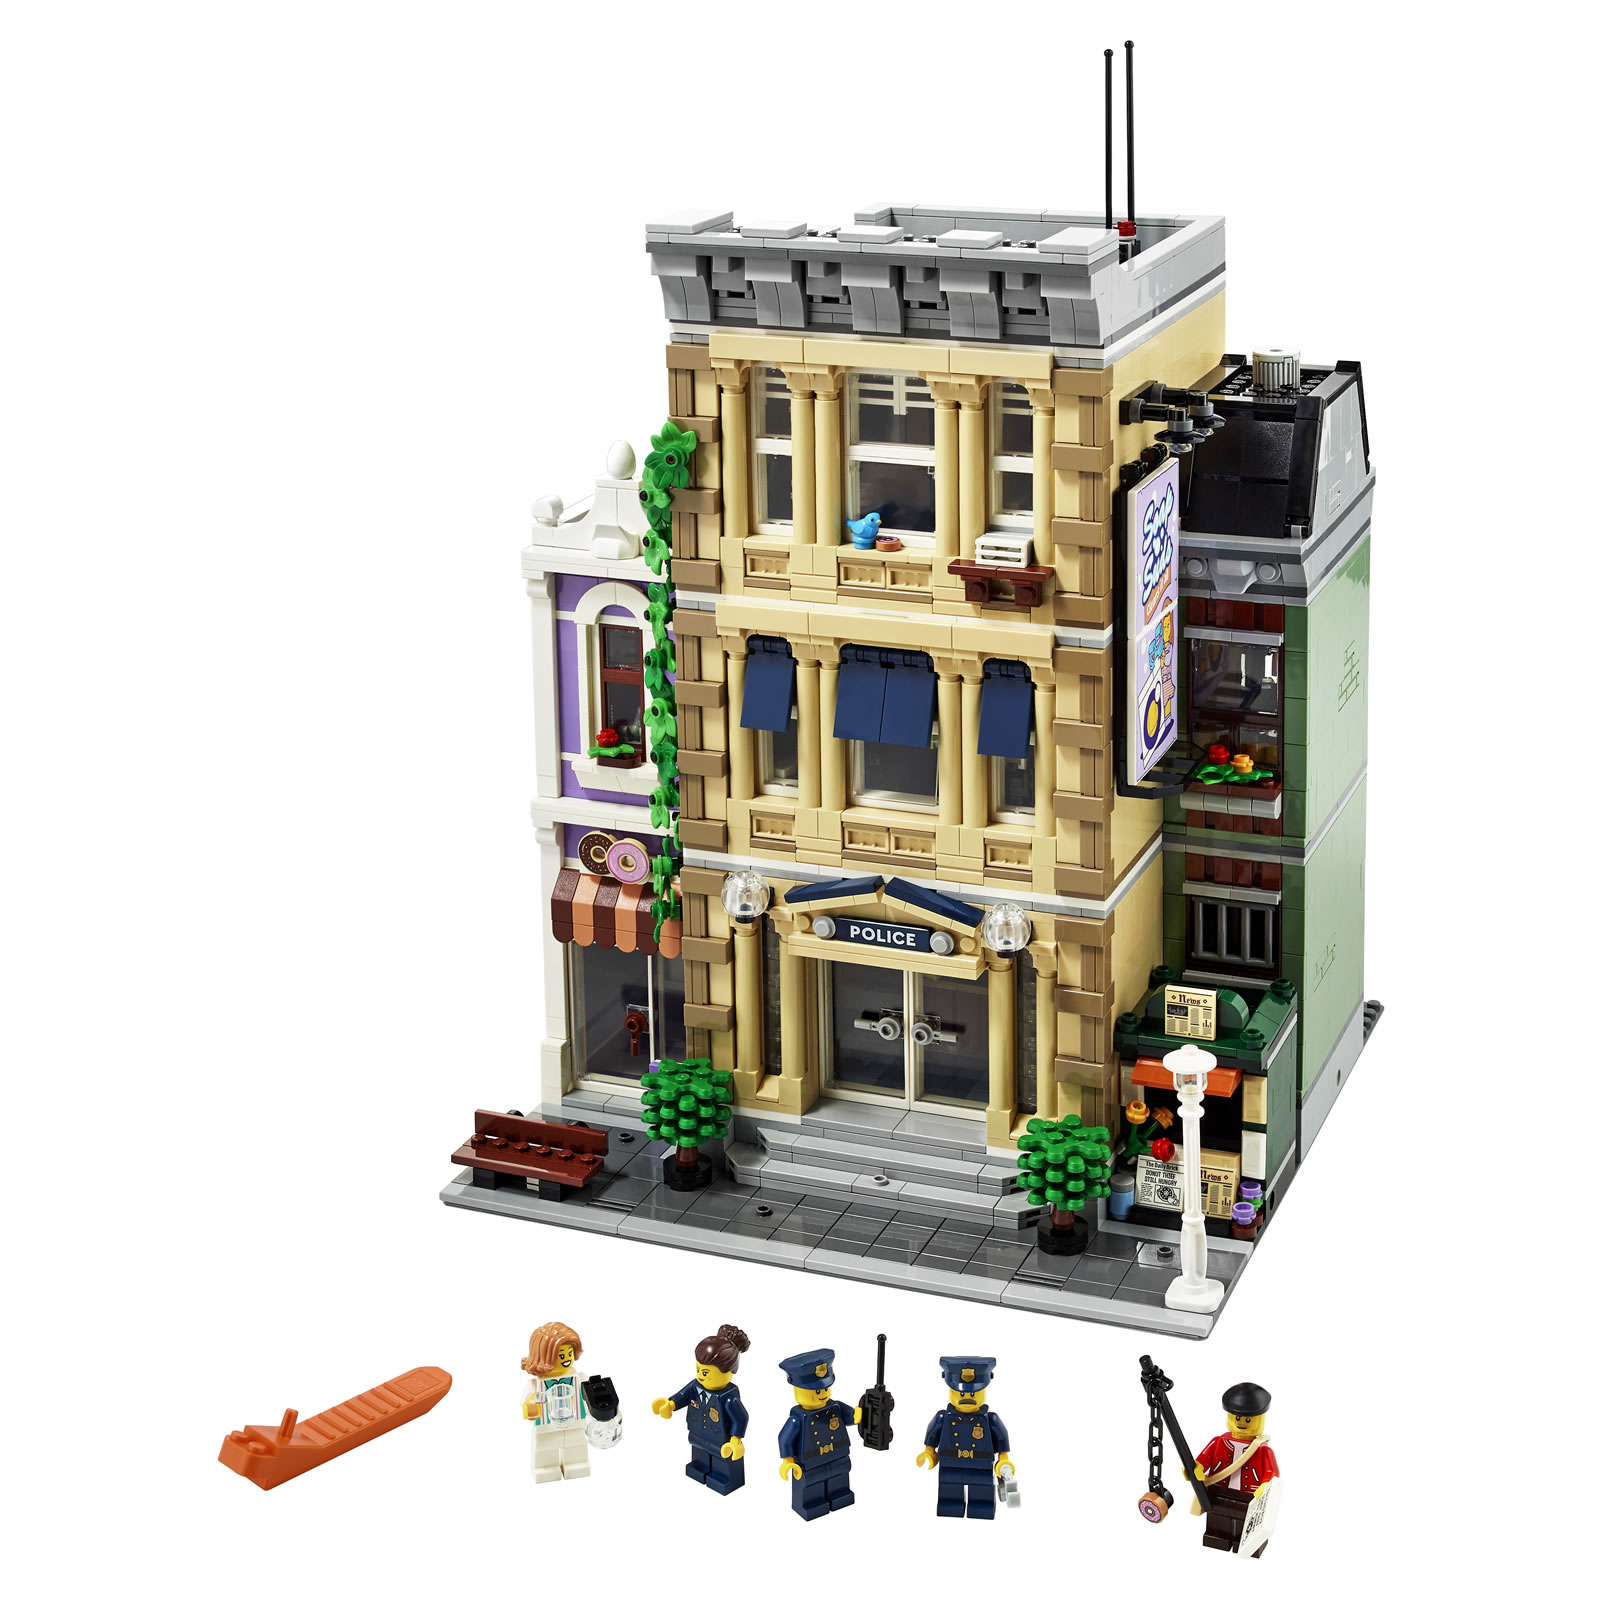 LEGO : Ze topik =) - Page 5 10278-lego-modular-police-station_1